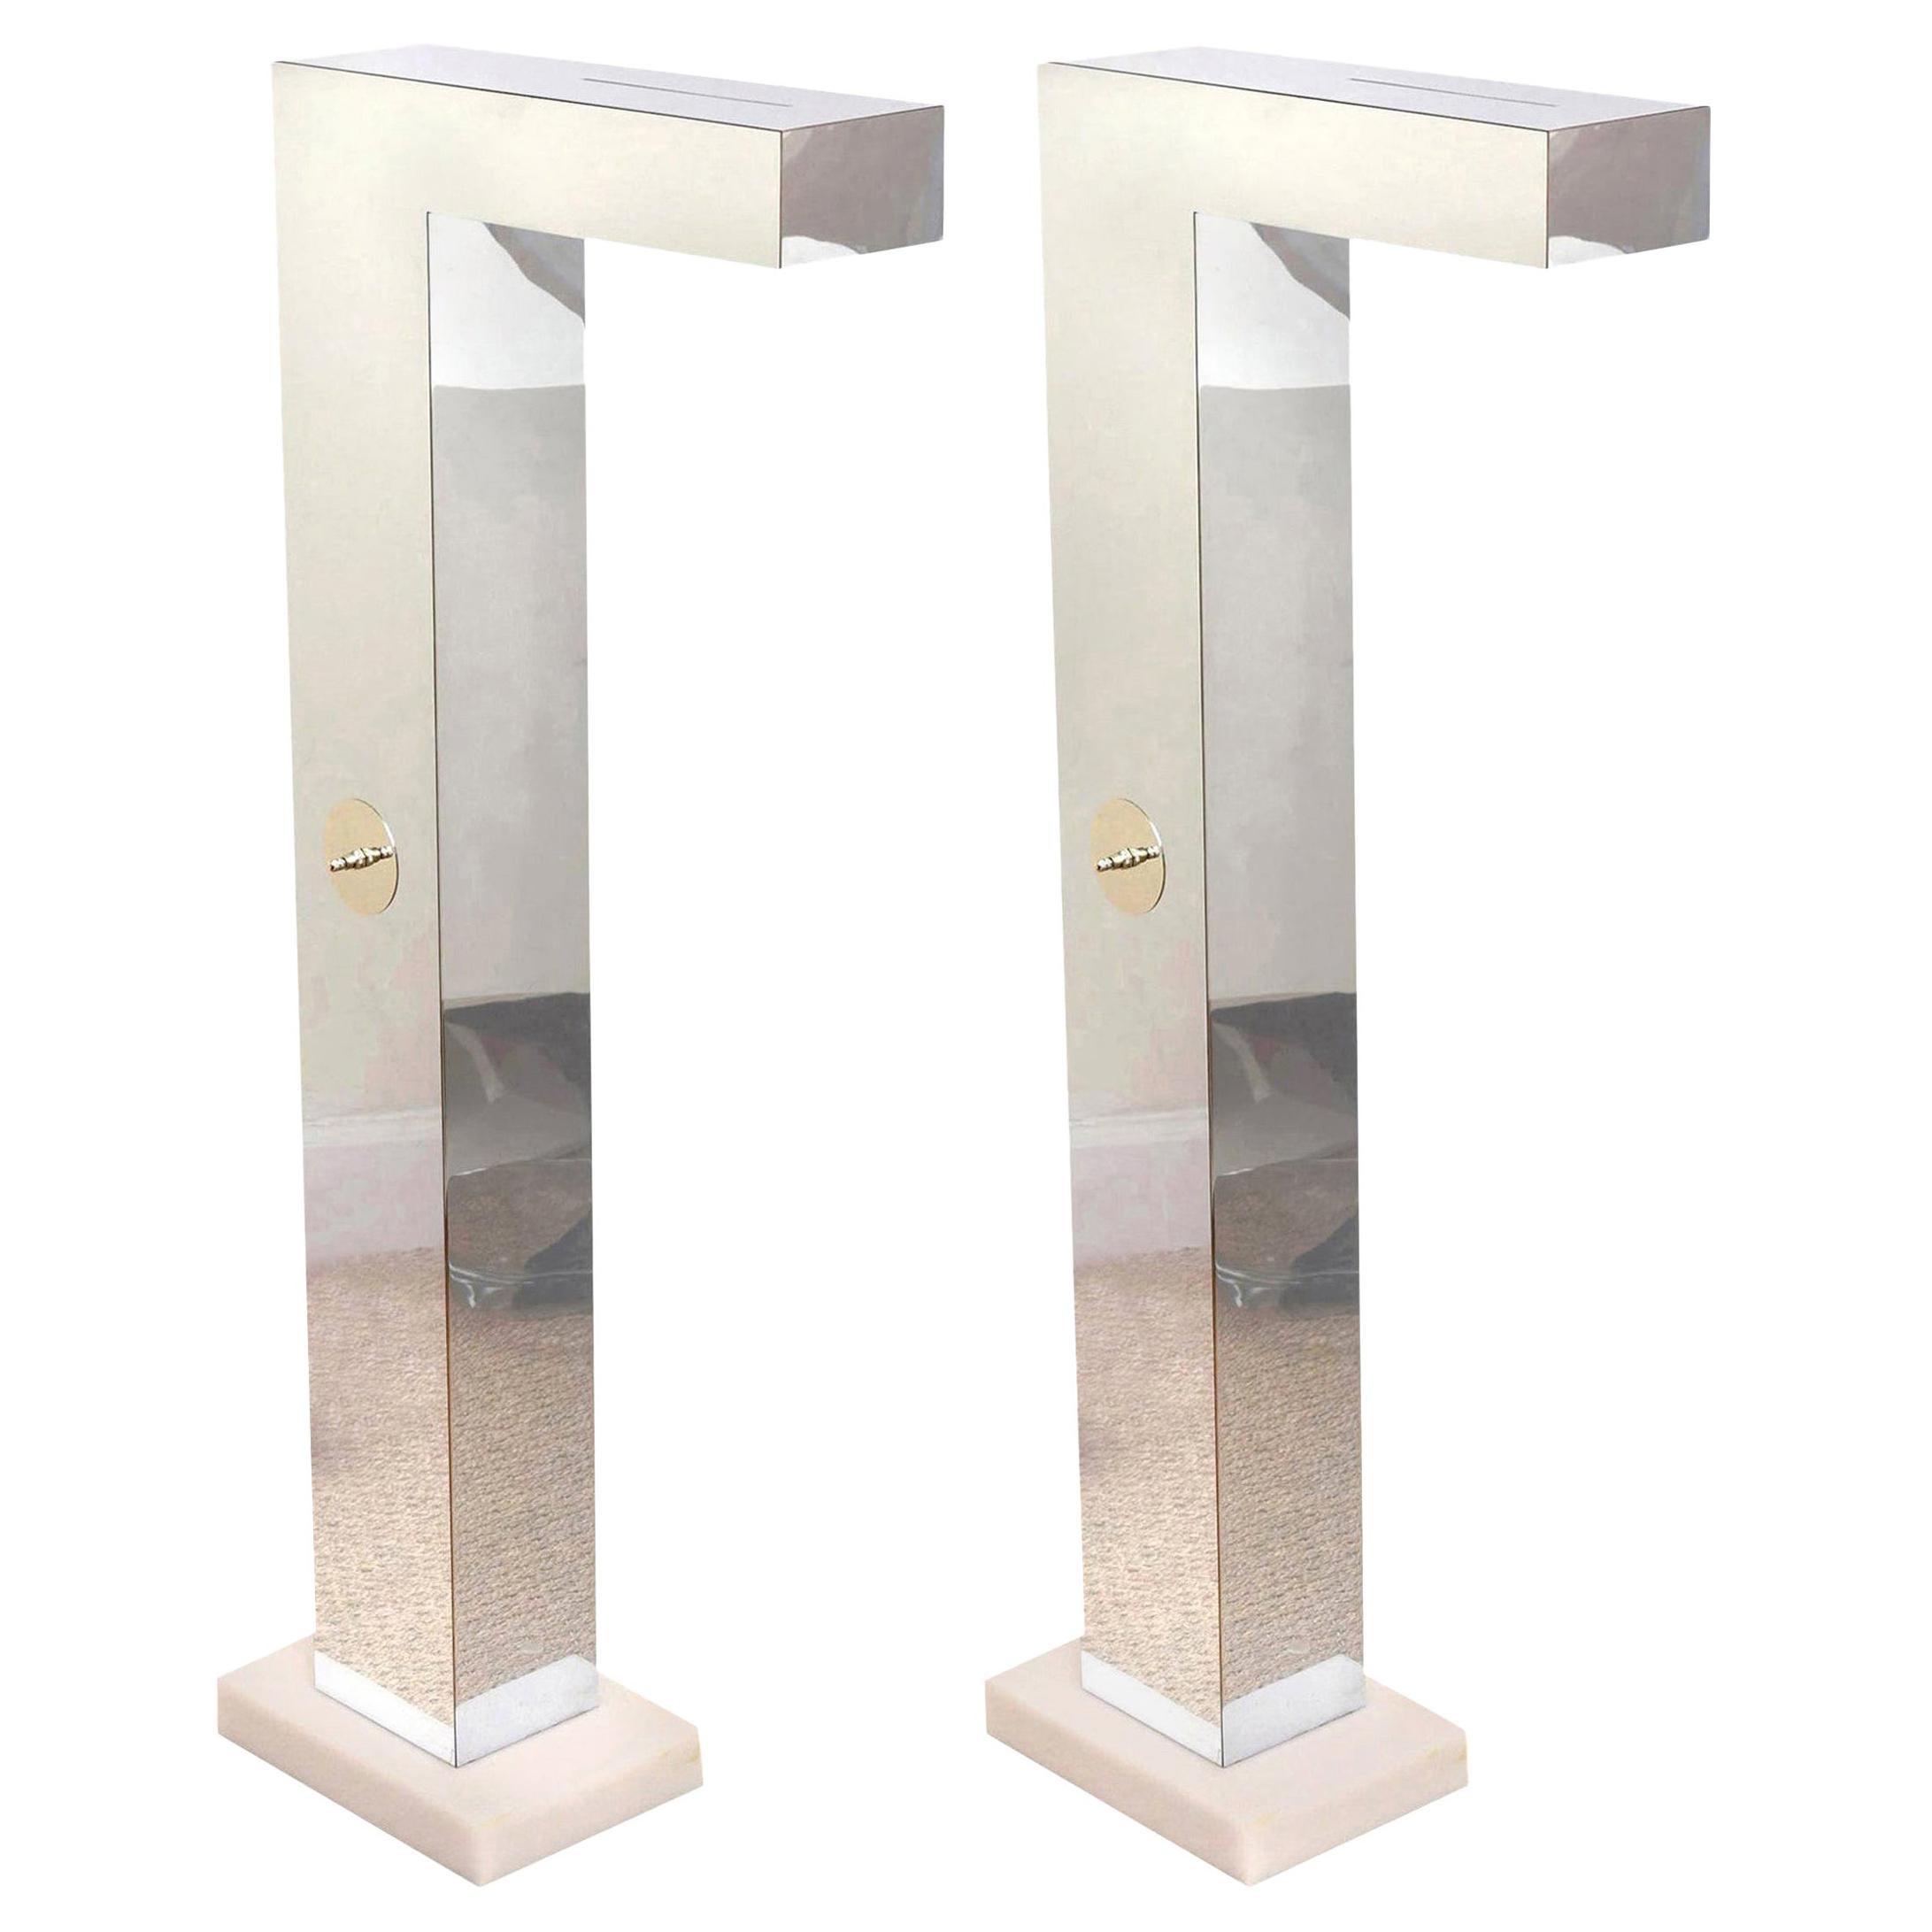 Neal Small Sculptural Floor Lamps Pair of Vintage